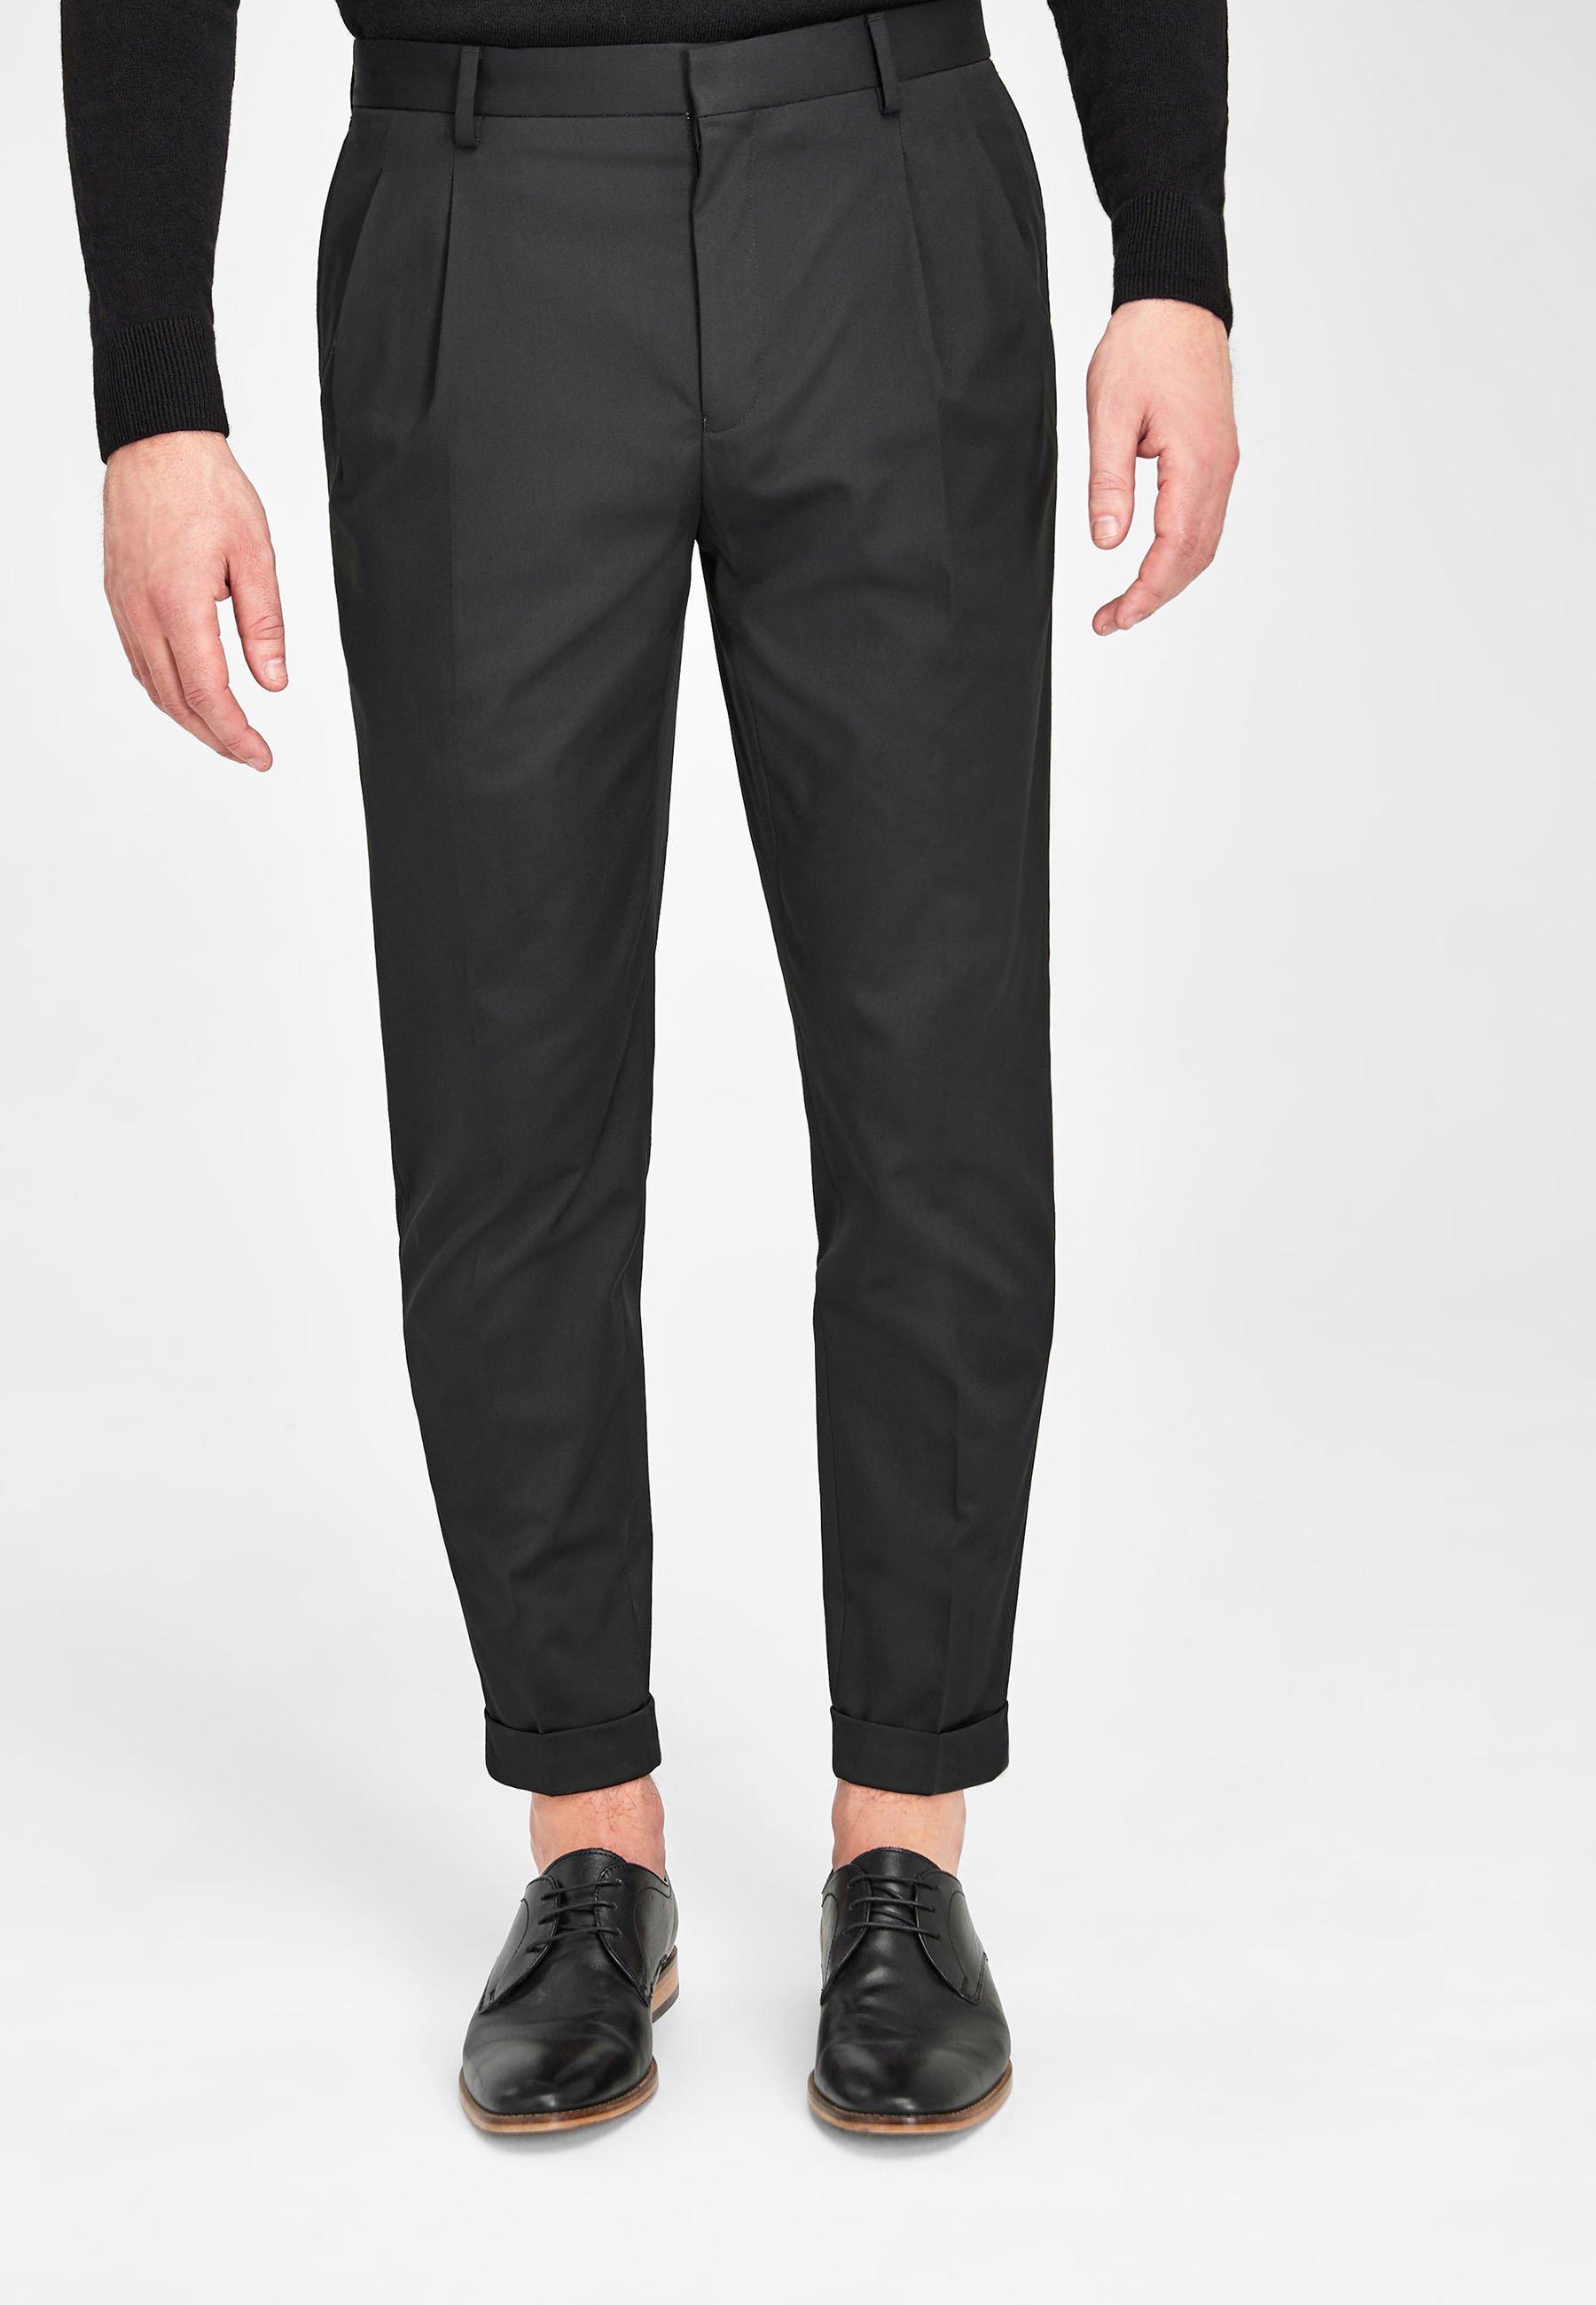 Uomo KHAKI FASHION PLEAT FIT TWIN PLEAT FORMAL TROUSERS - Pantaloni